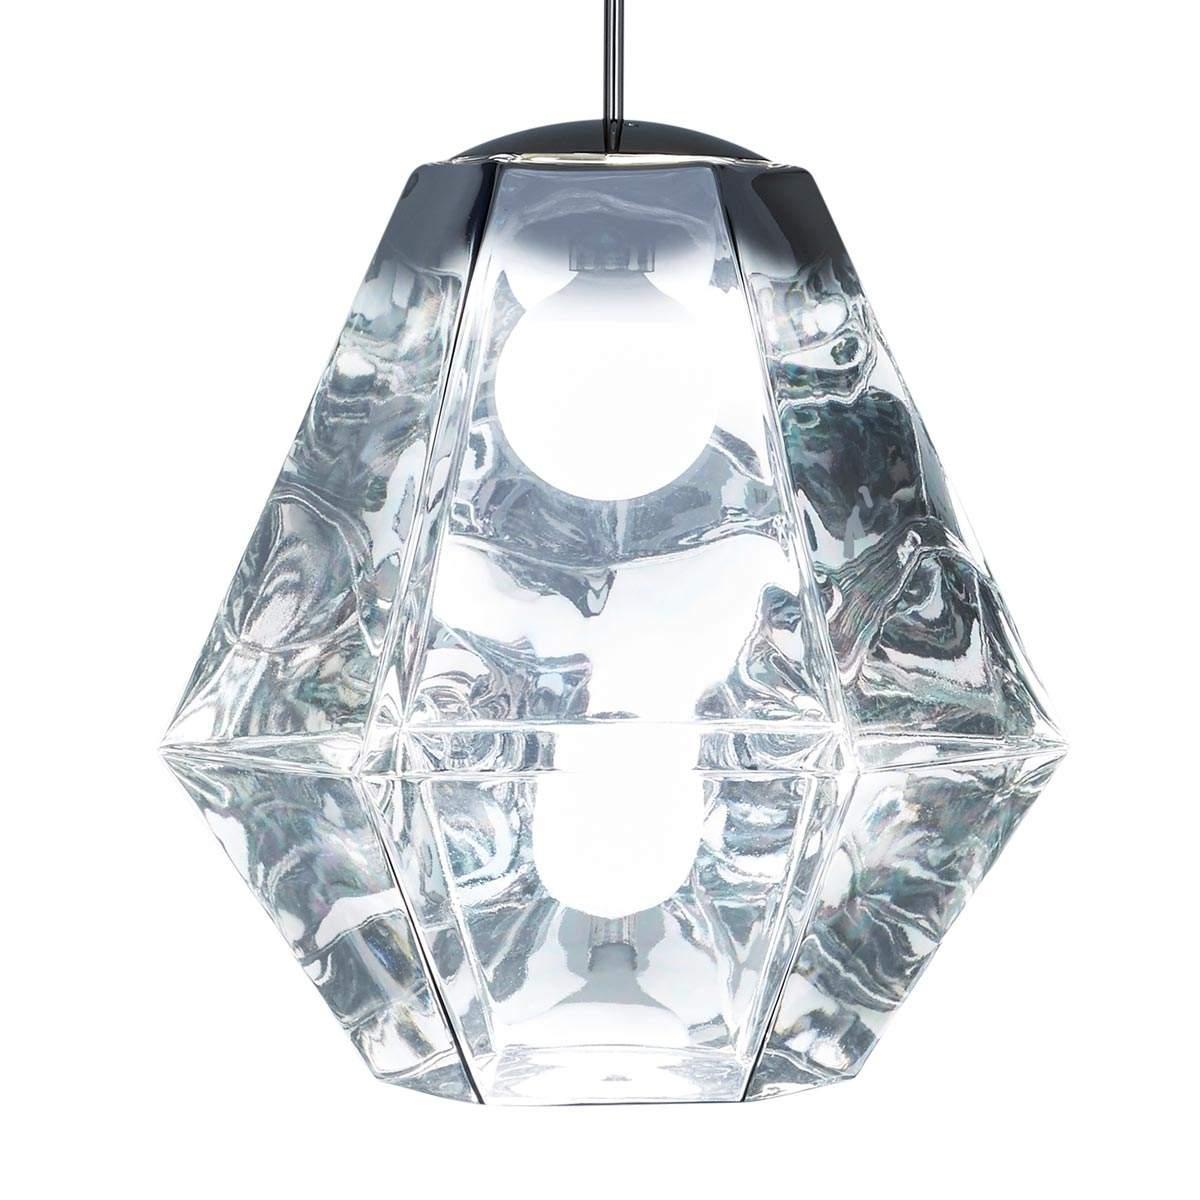 Cut Tall – lampada sosp efficiente finitura cromo Illuminazione per interni